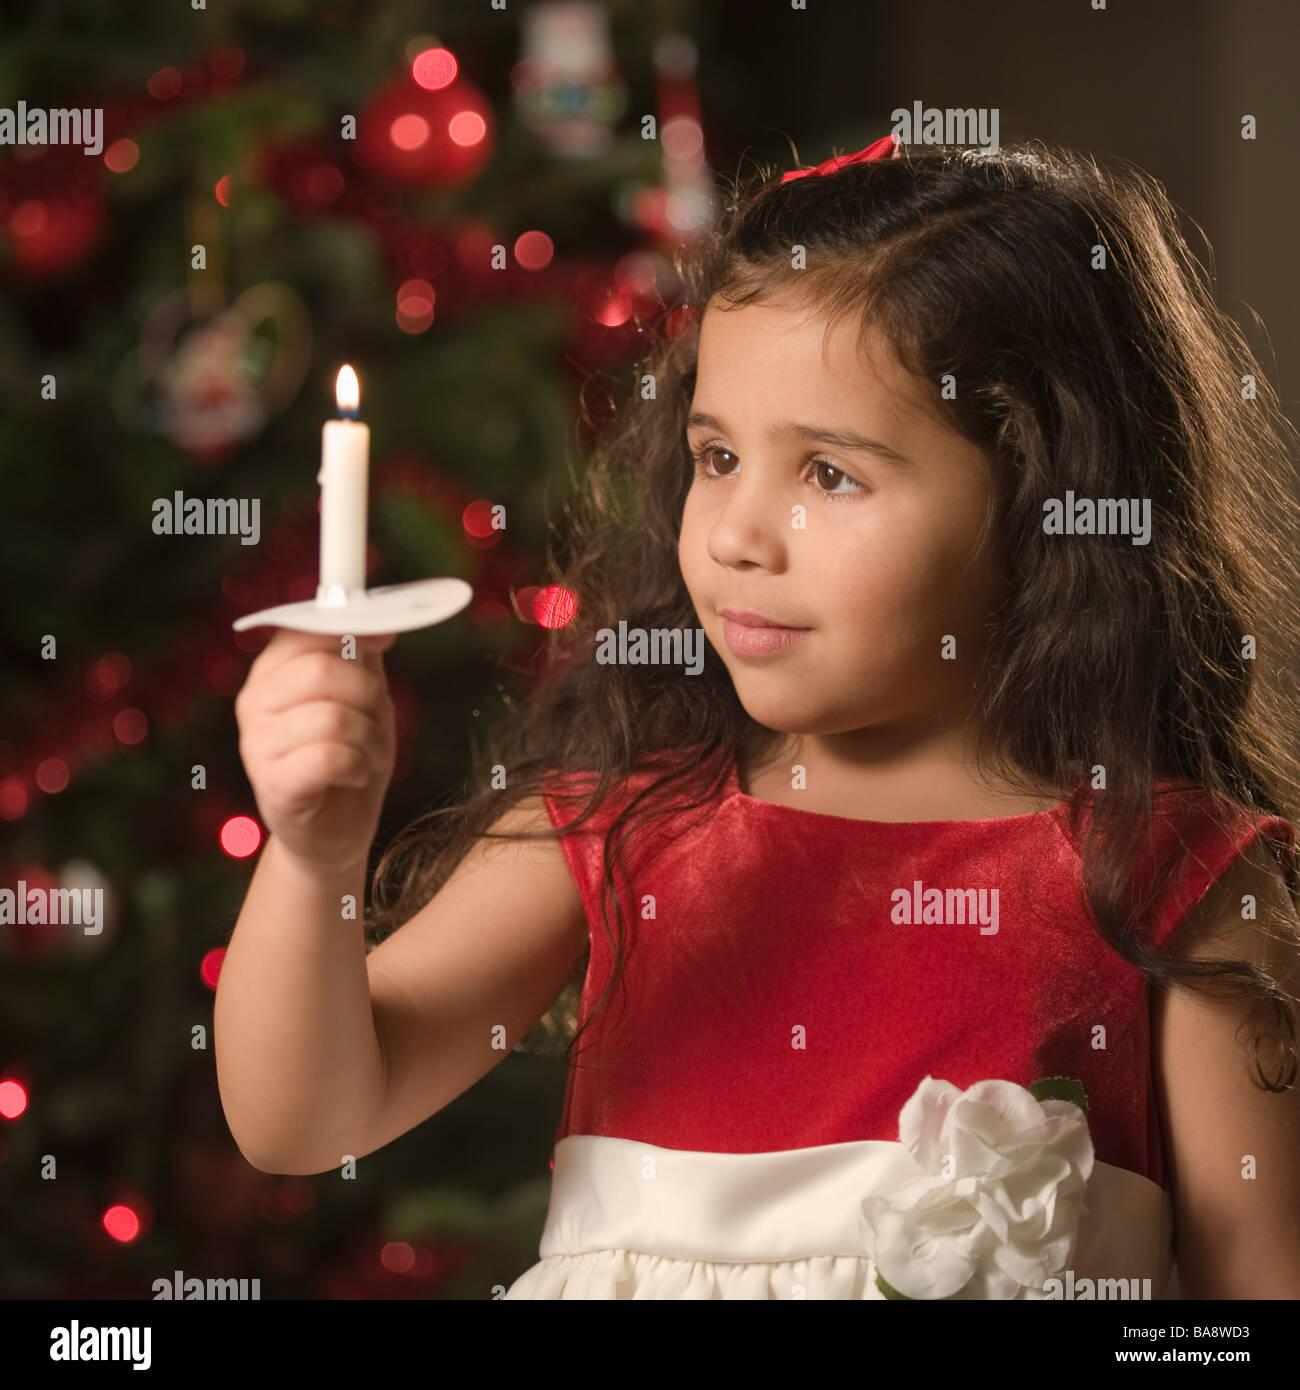 Girl holding Christmas candle - Stock Image